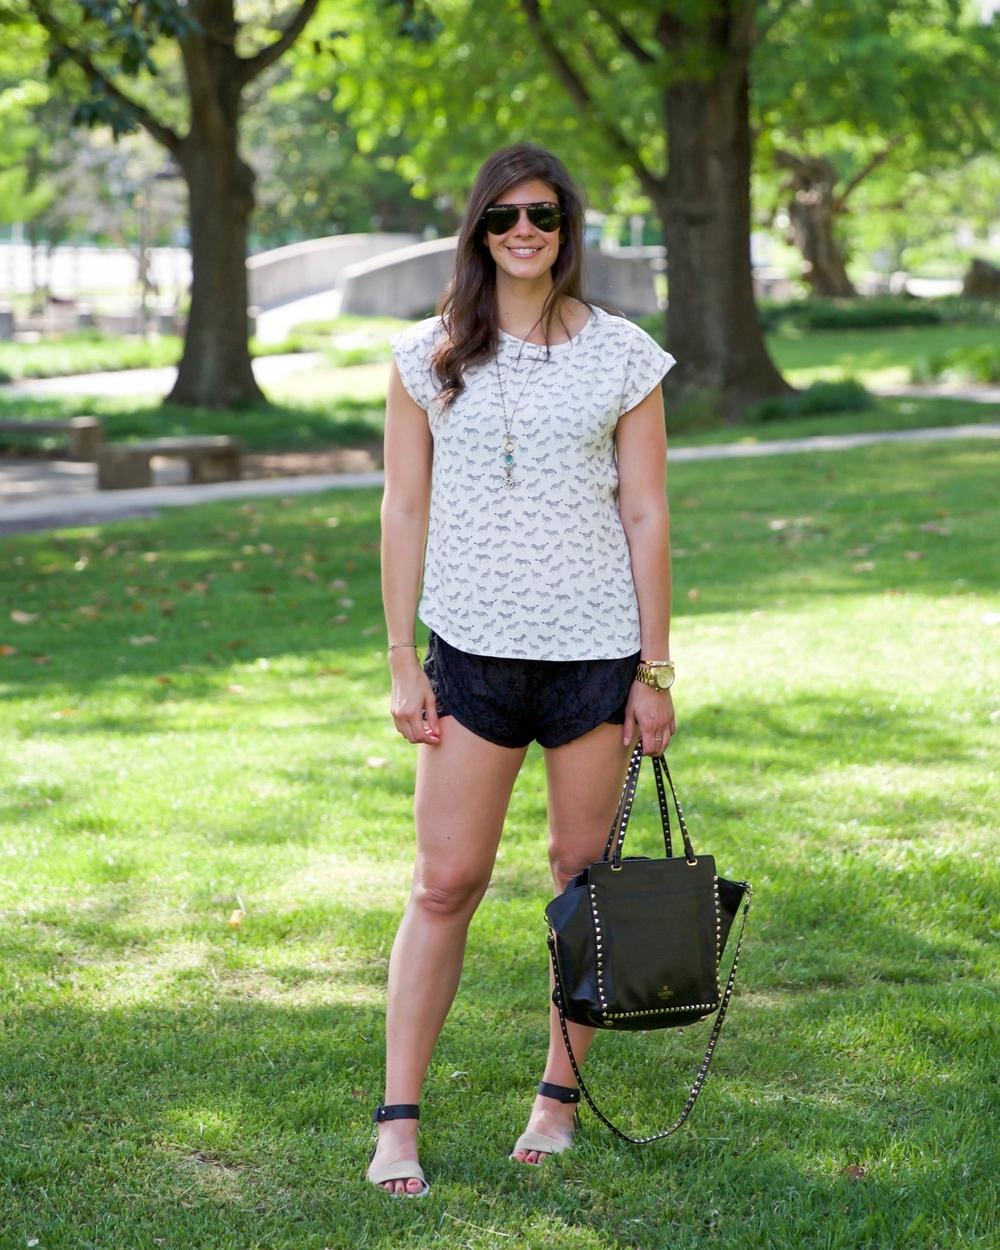 LaurenSchwaiger-Life-Style-Blog-OOTD-HM-Zebra-Blouse.jpg